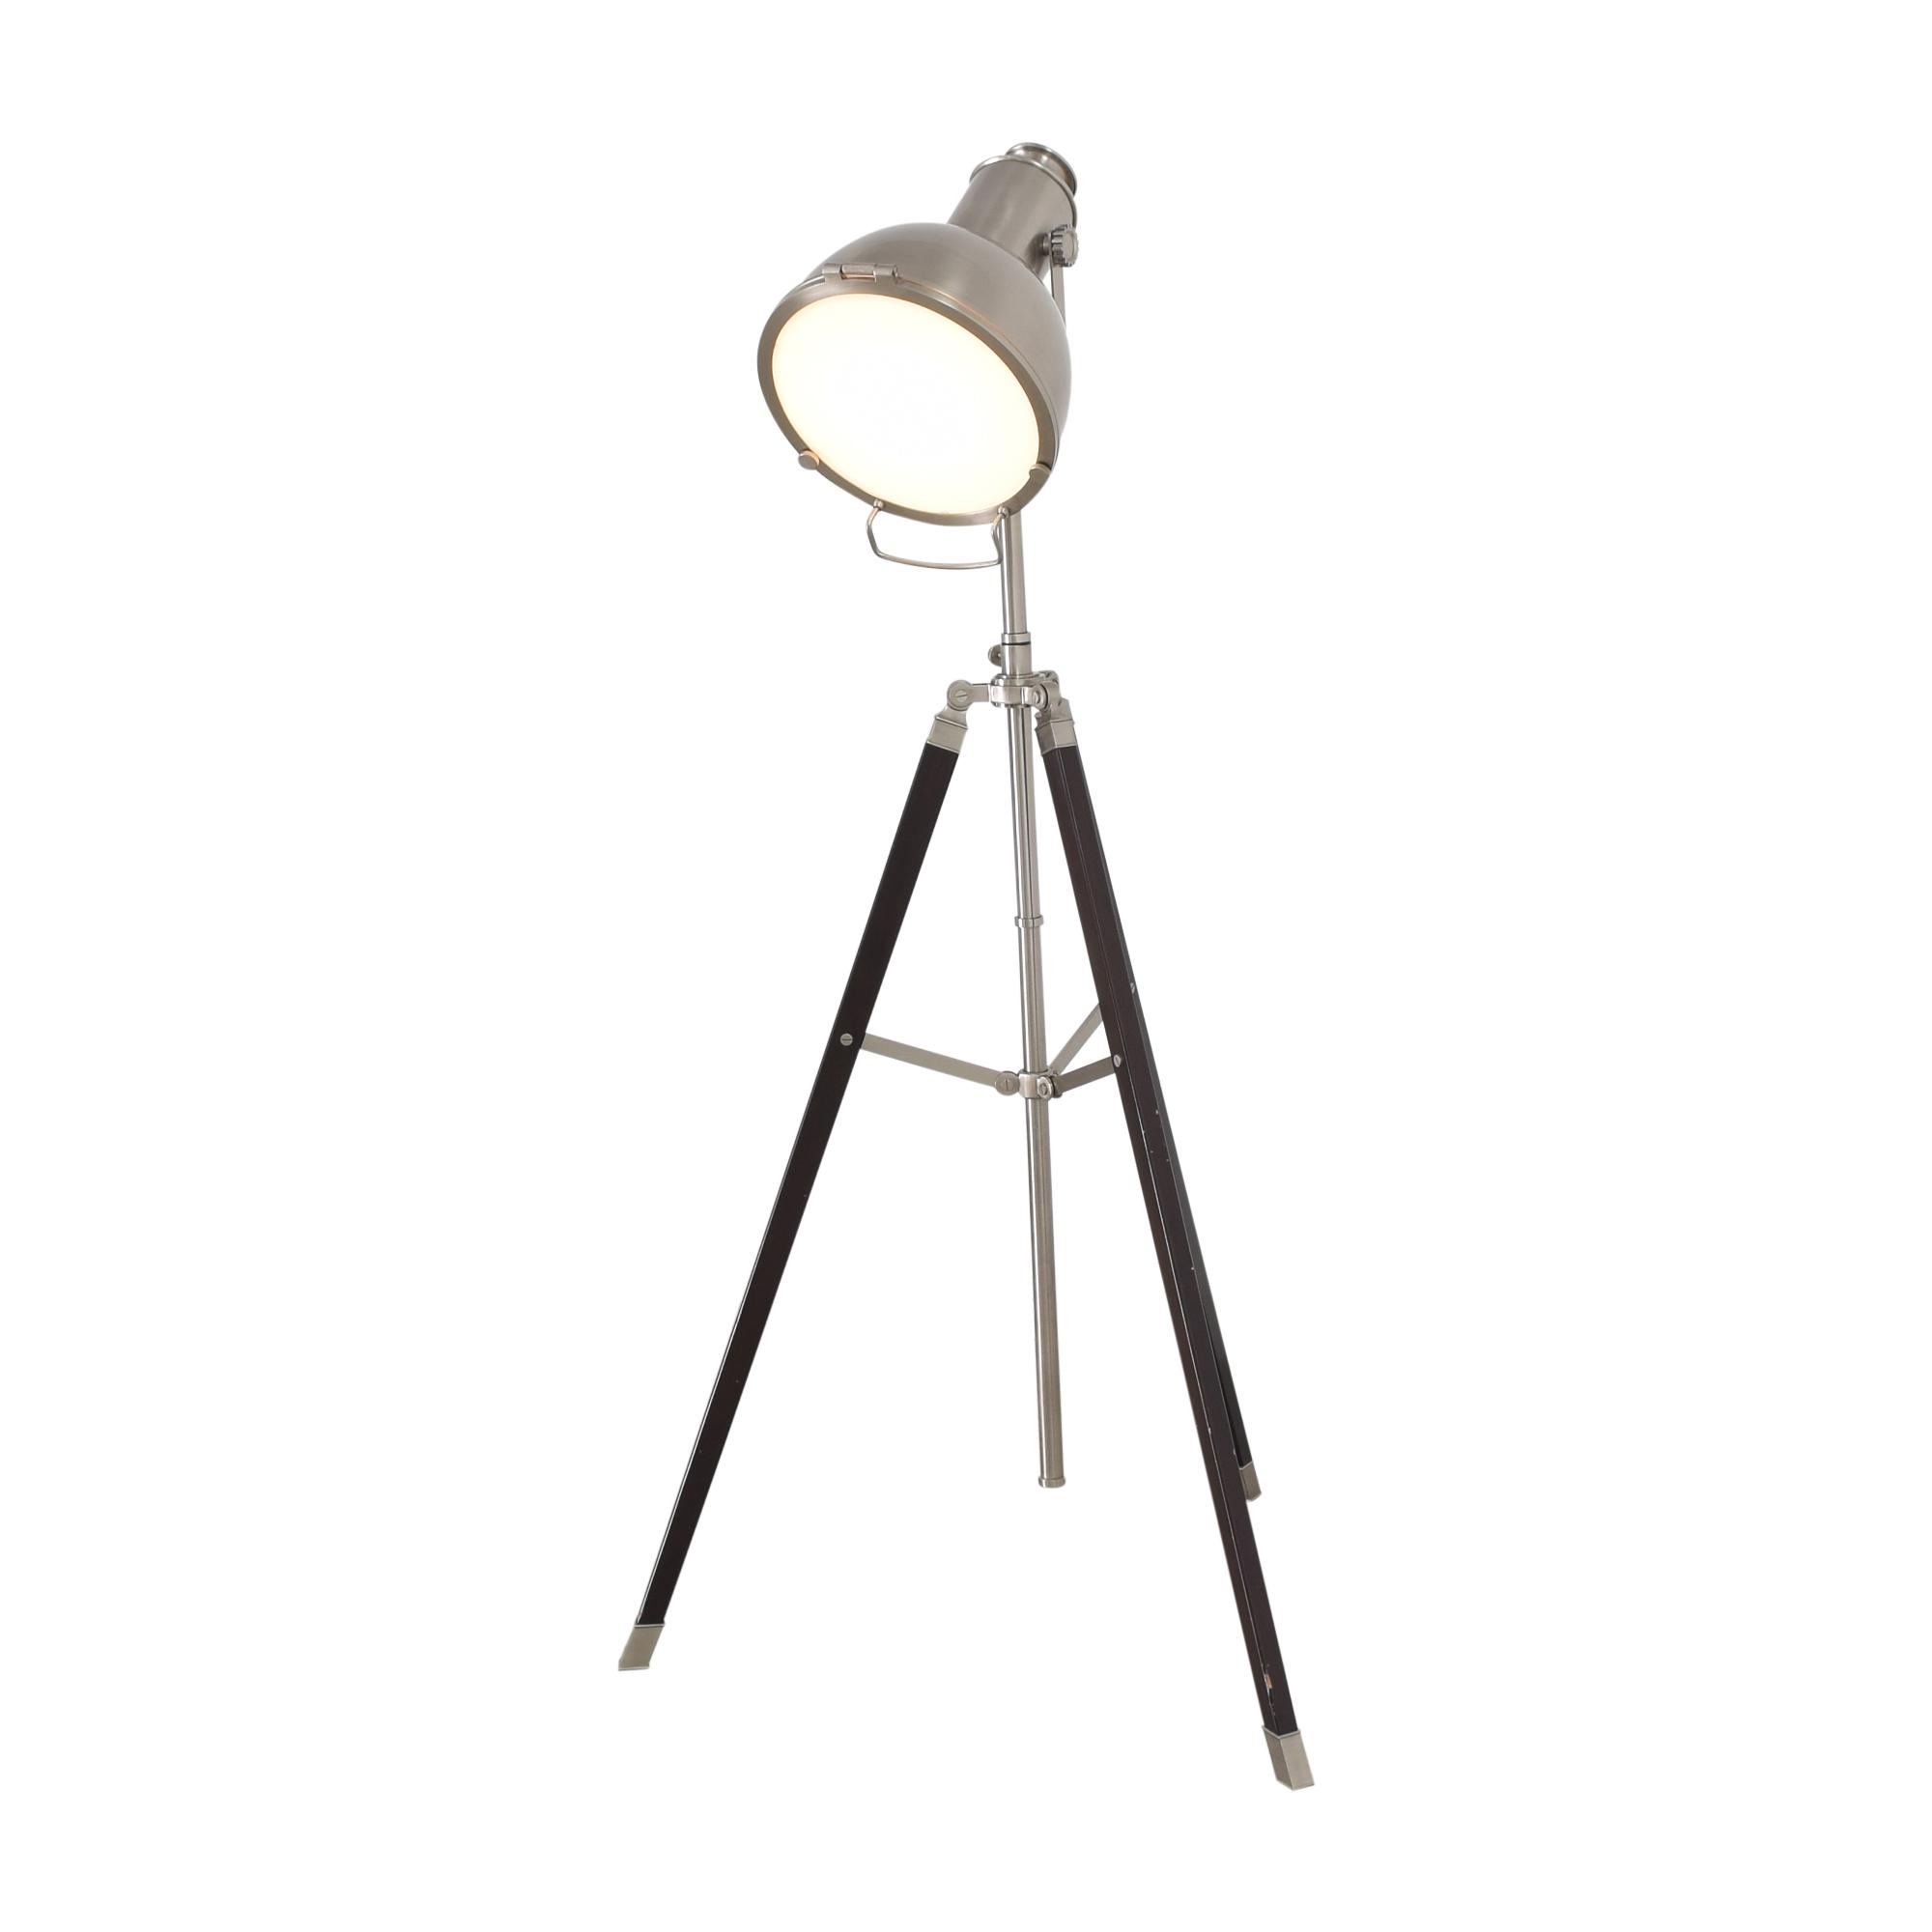 Ethan Allen Ethan Allen Retro Photographers Tripod Lamp used